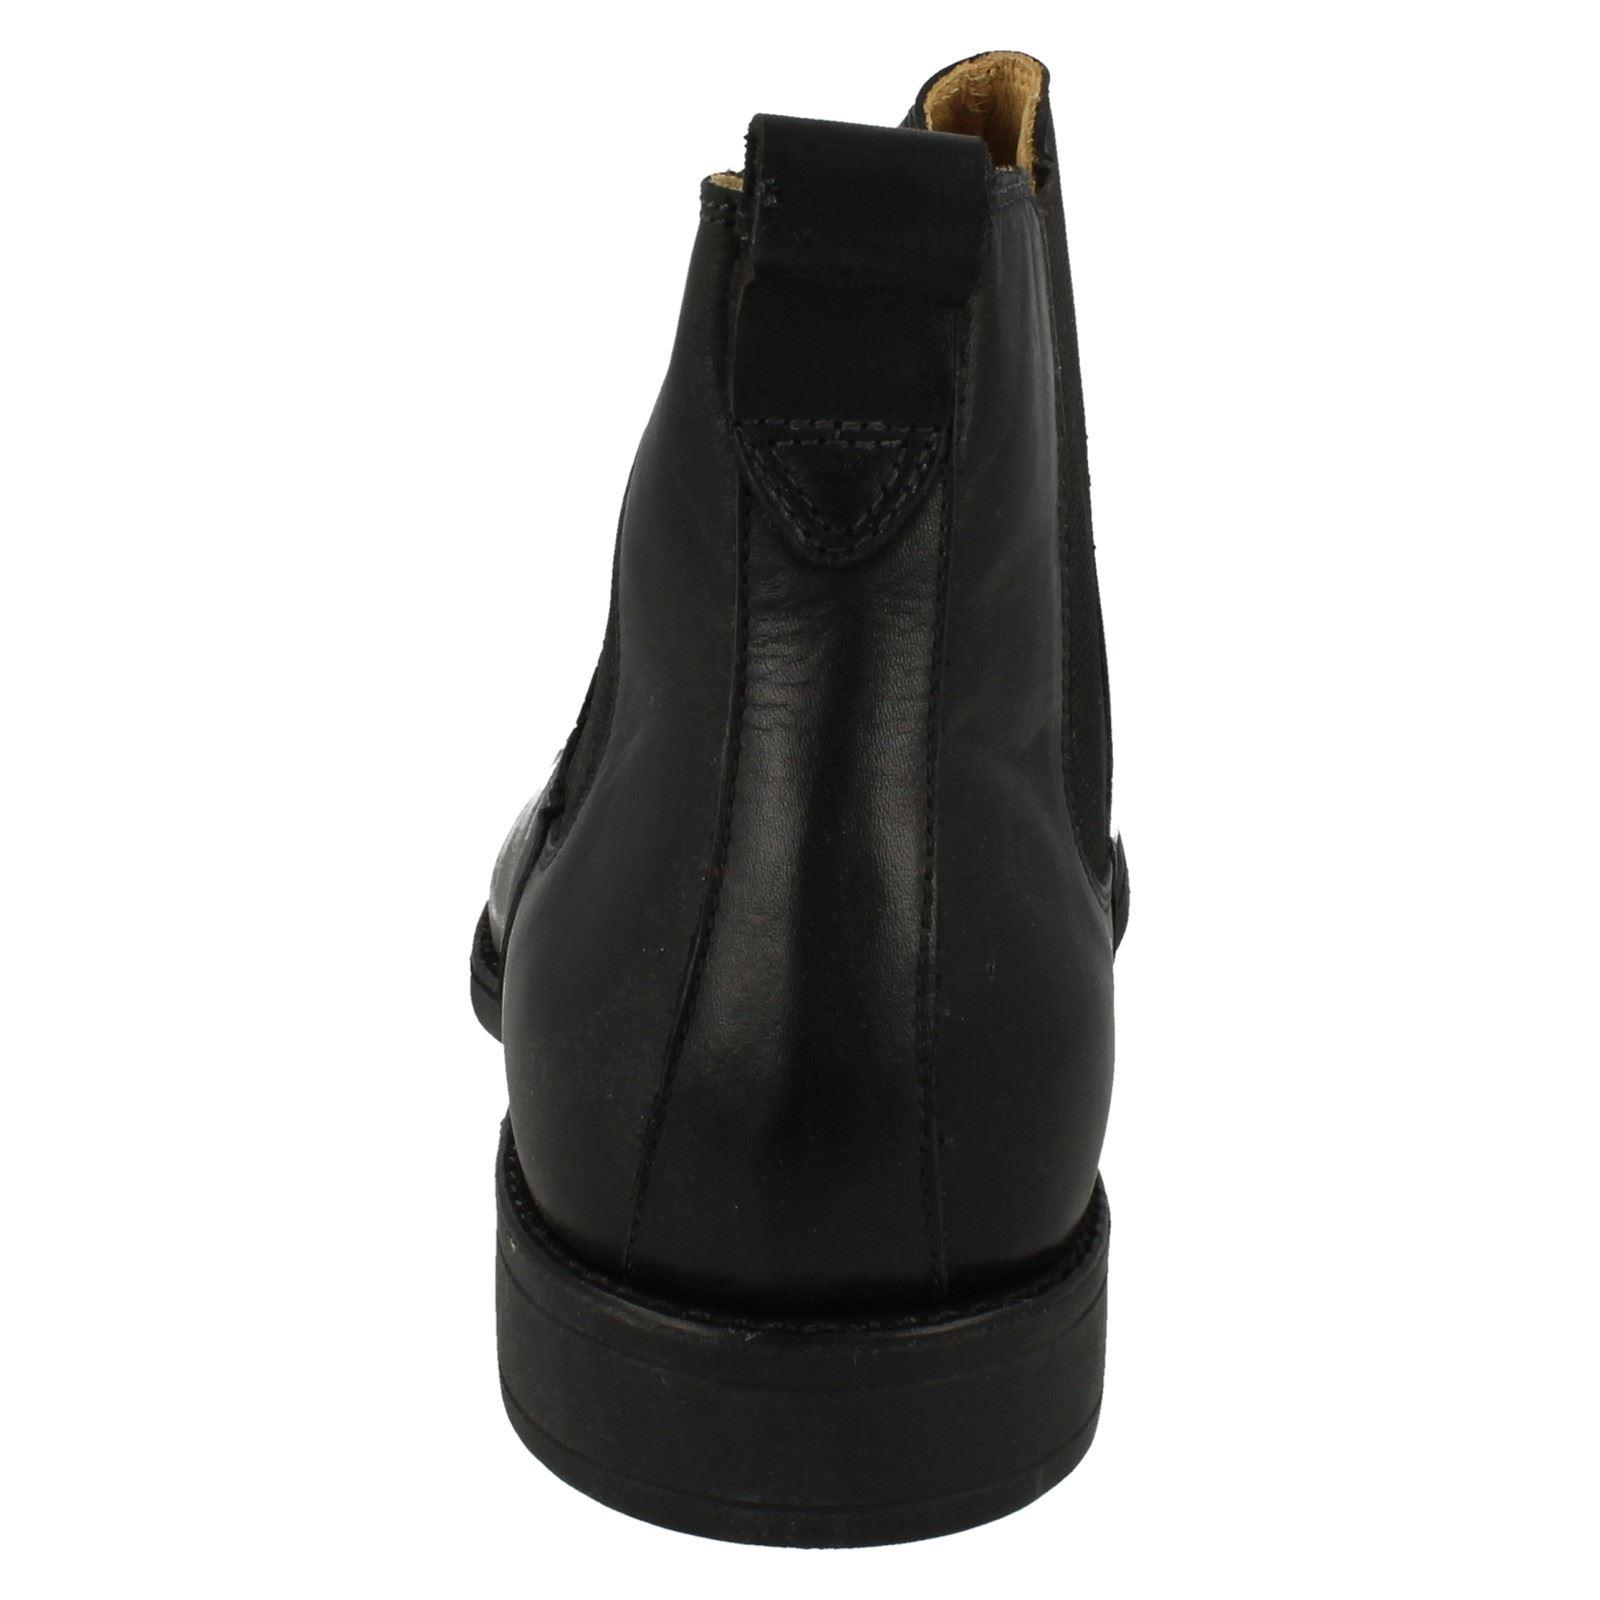 Mens-Anatomic-Chelsea-Boots-039-929211LB-039 thumbnail 4